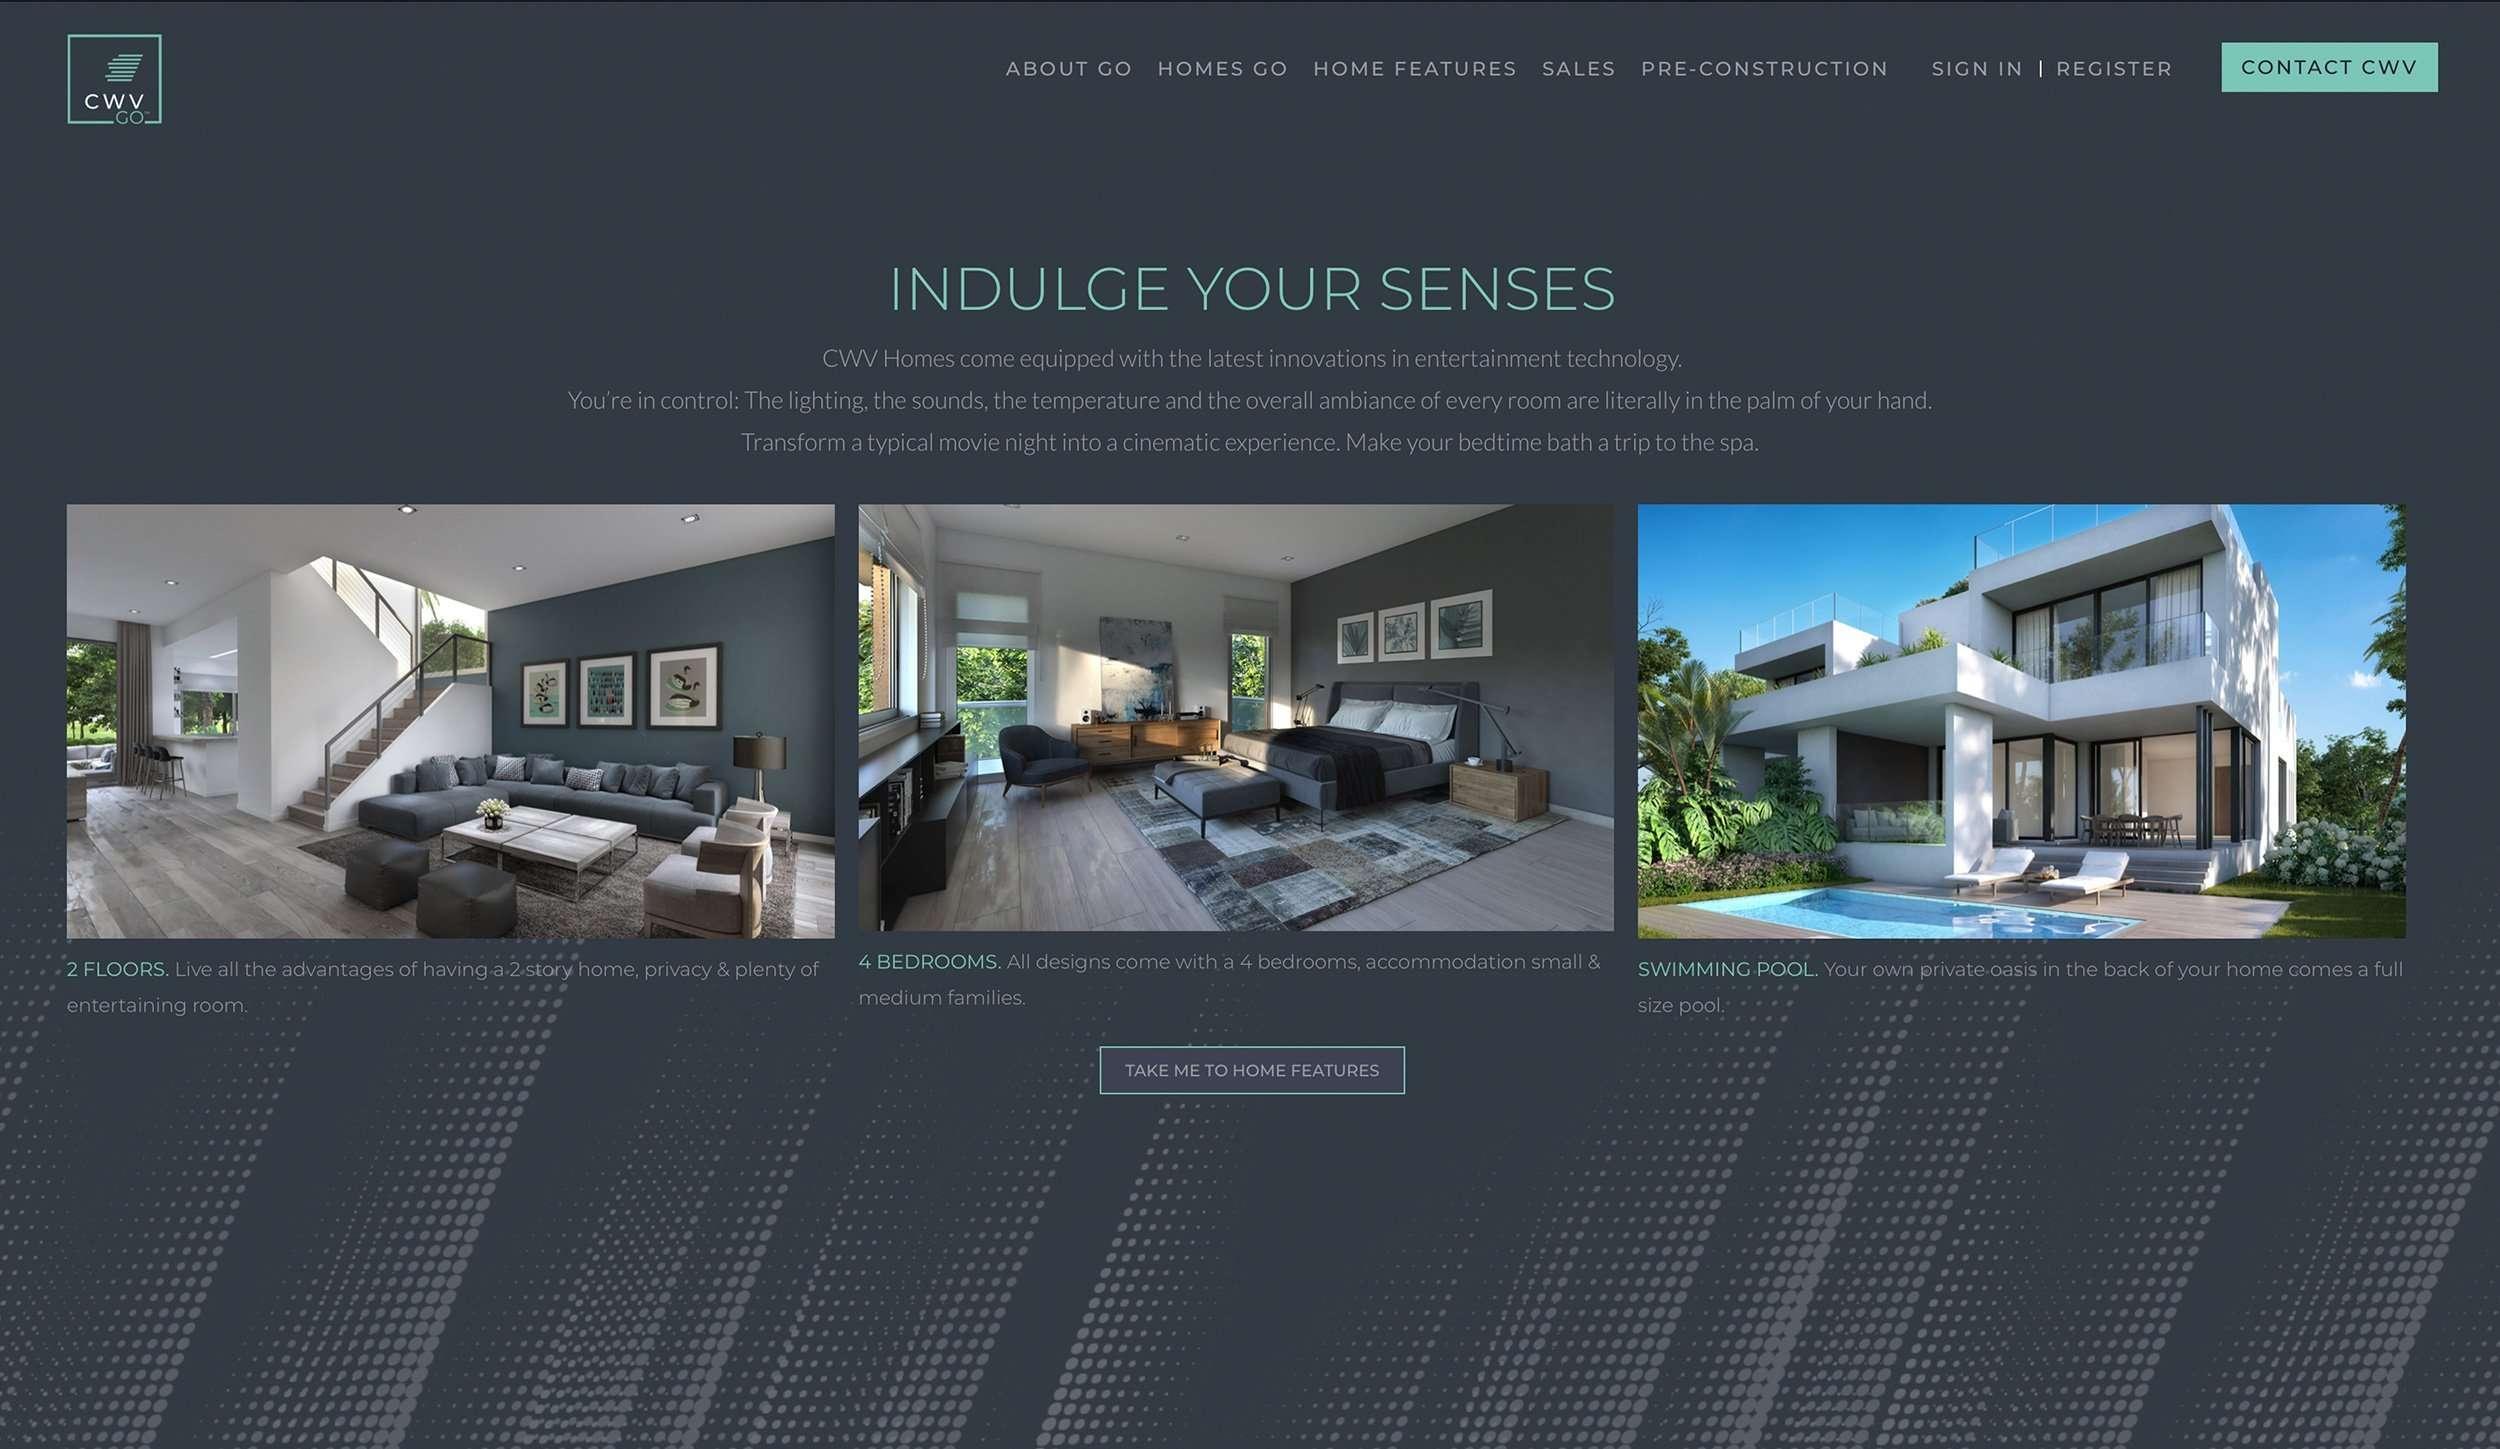 cwv-group-miami-usa-estados-unidos-real-estate-online-lab-lisbon-web-development-web-design-9